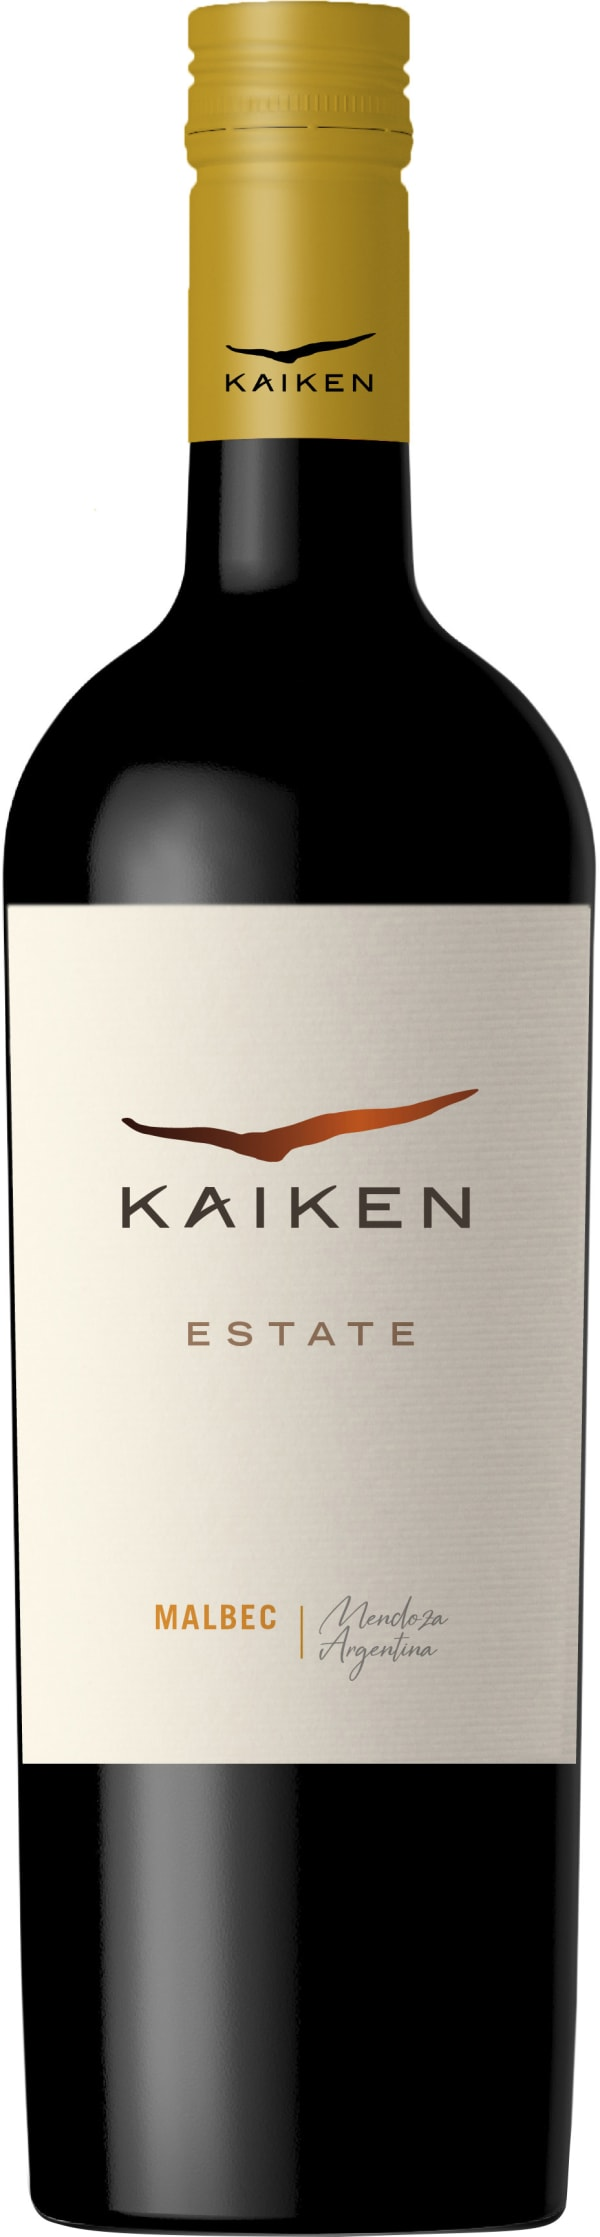 Kaiken Reserve Malbec 2015